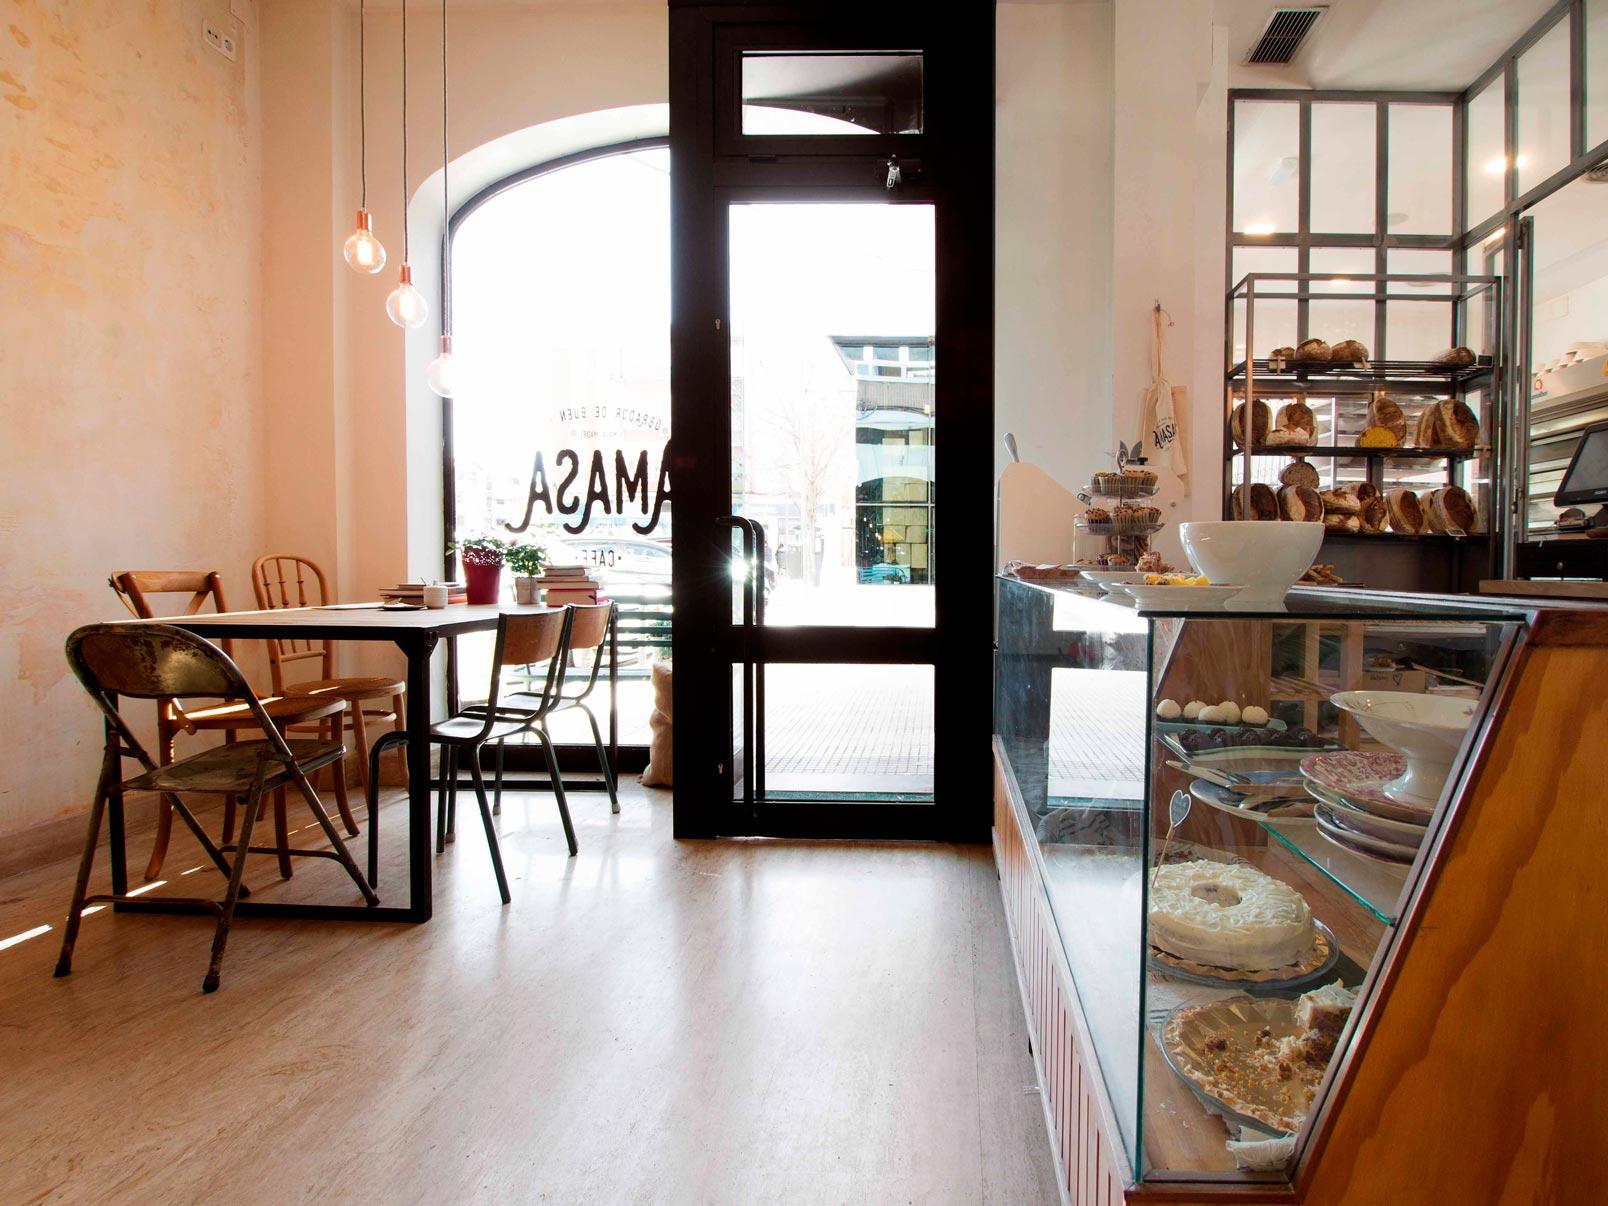 Panadería Amasa por dentro